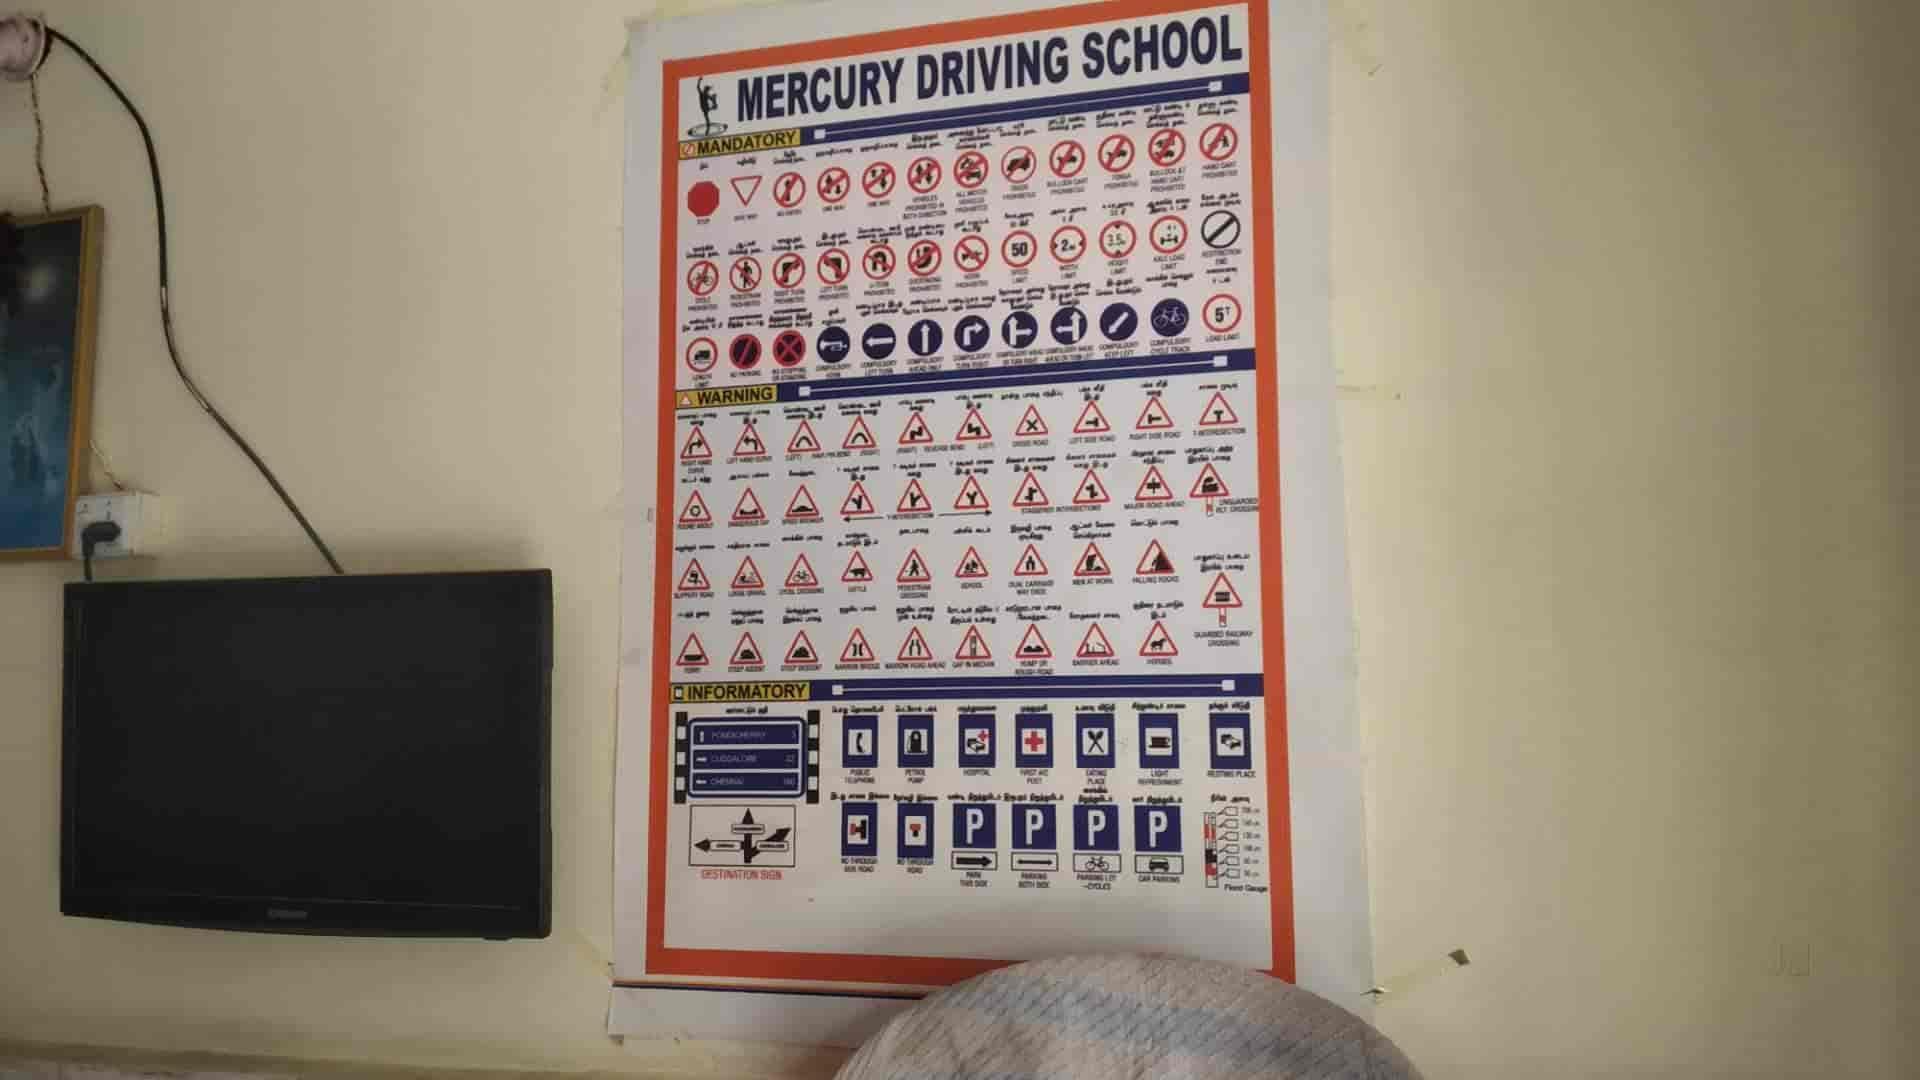 Mercury Driving School, Thattanchavadi - Motor Training